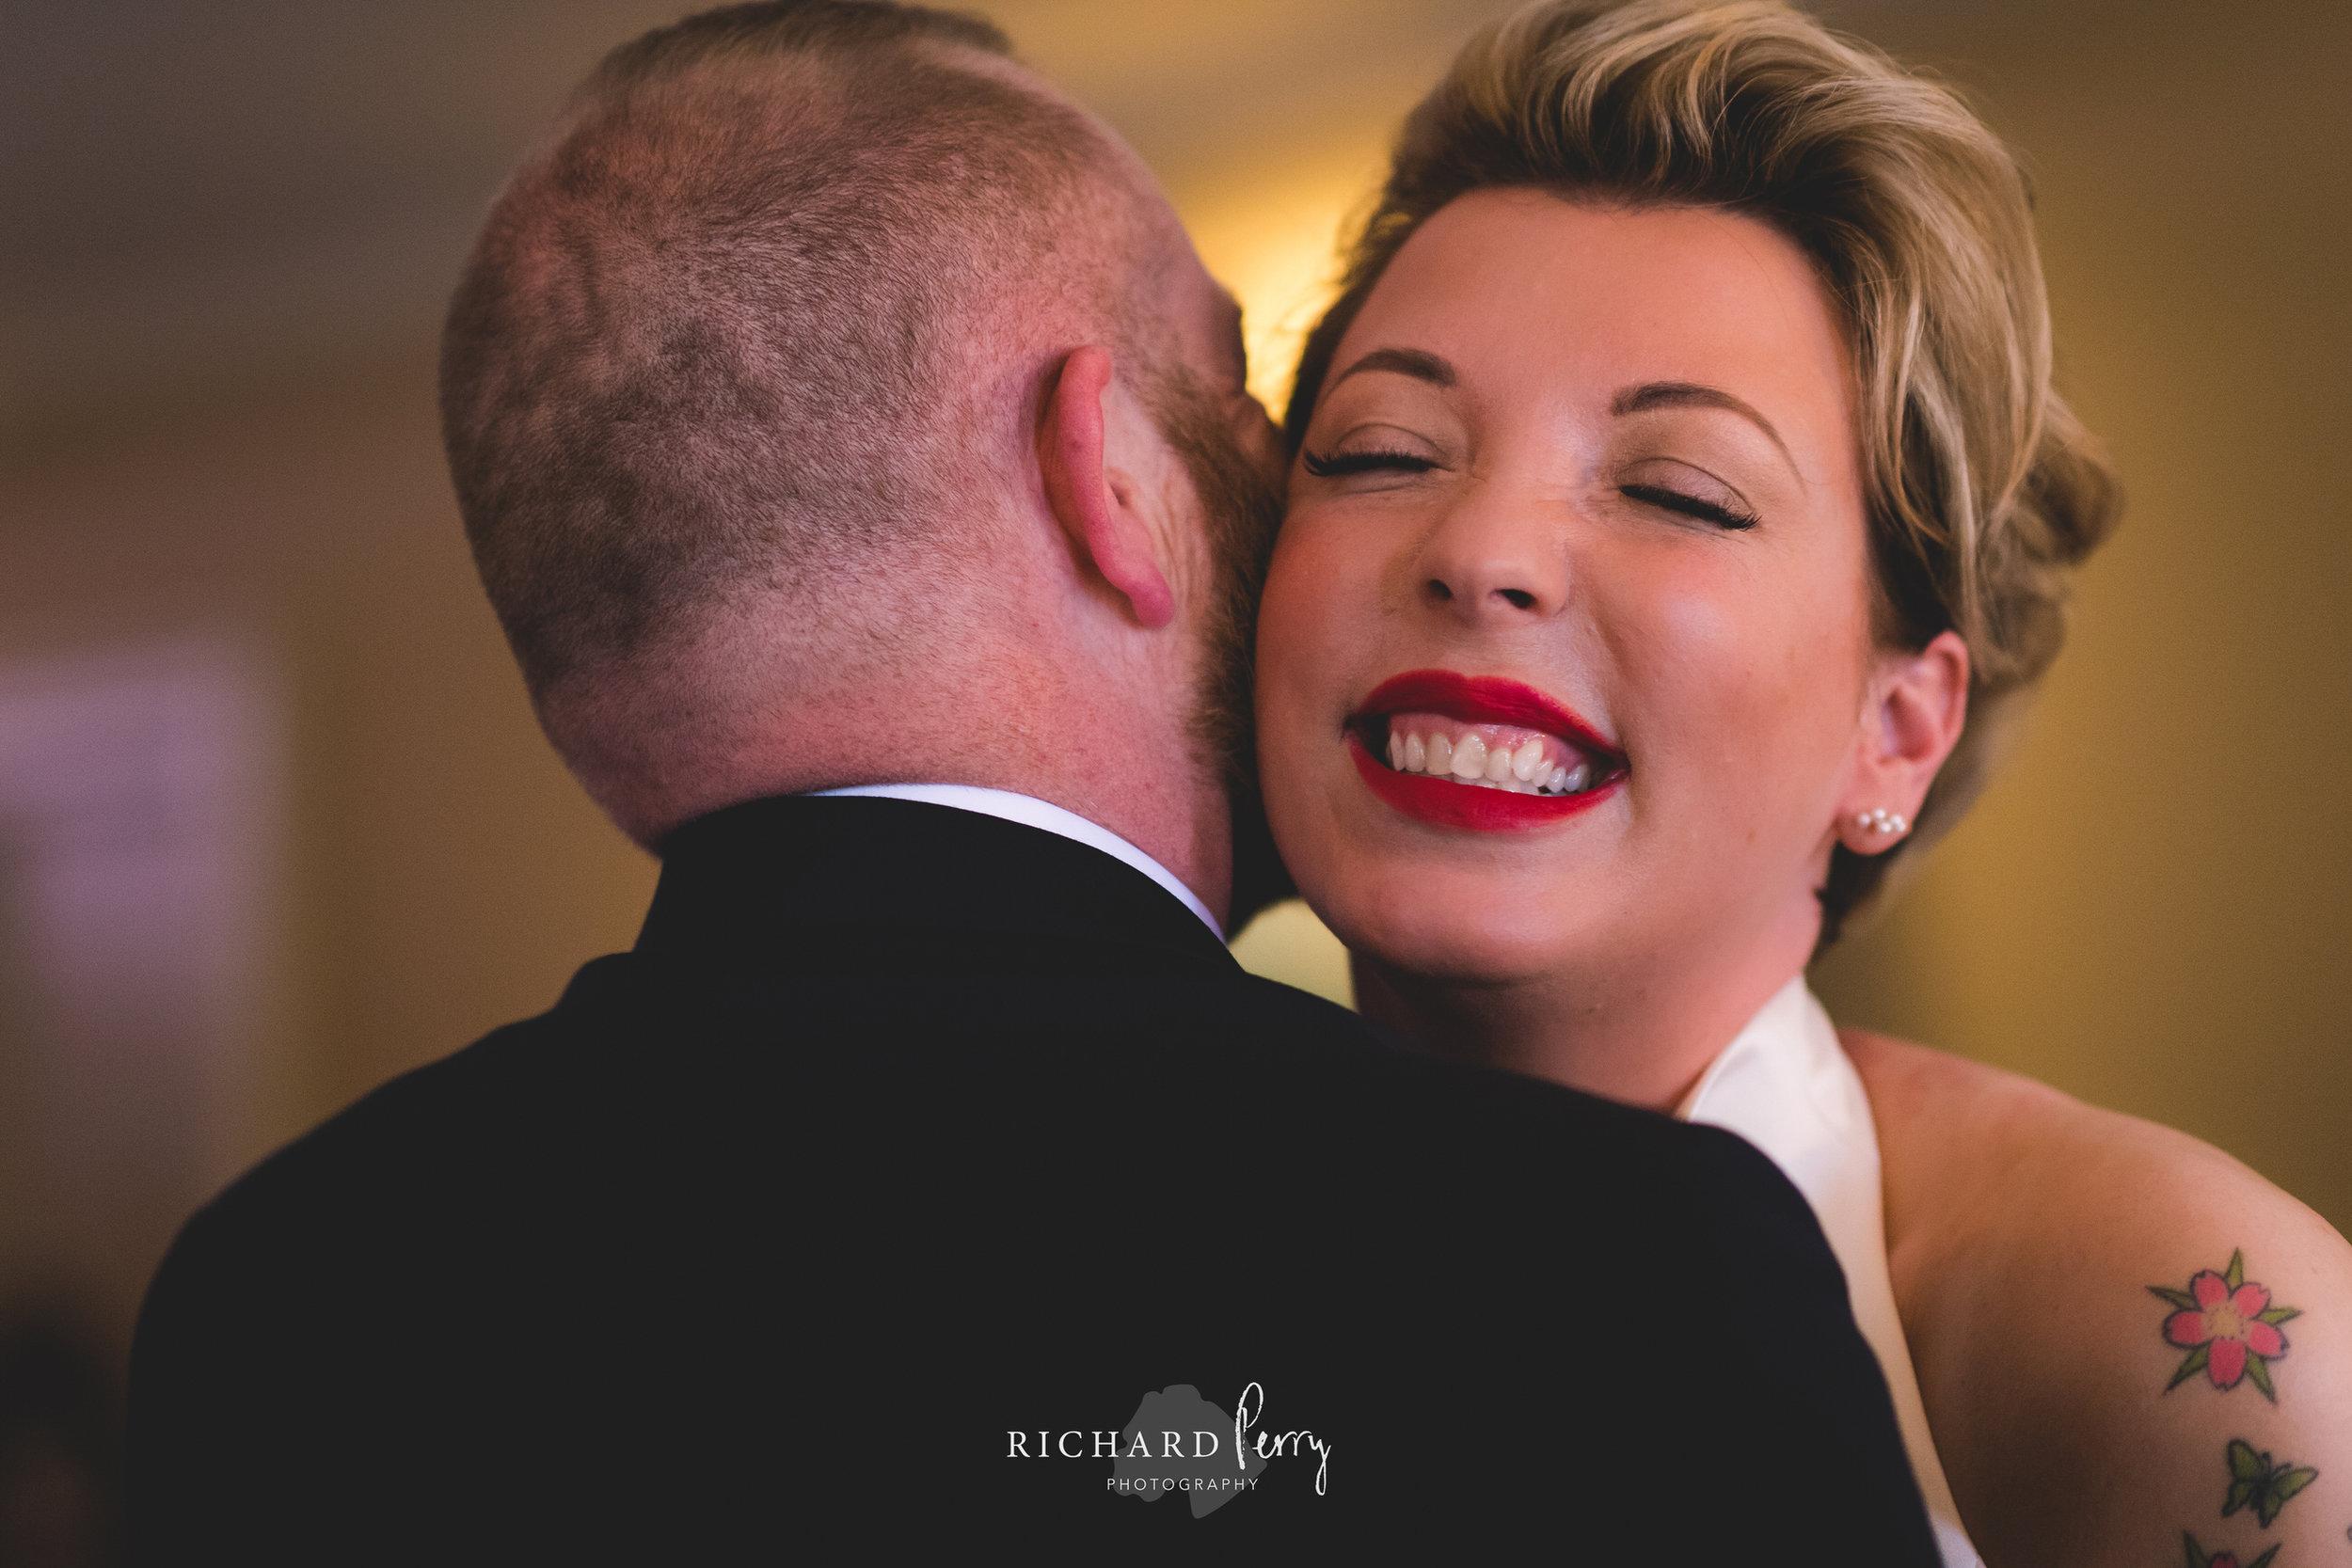 yorkshire-wedding-photographer-destination-archerfield-house-17.jpg